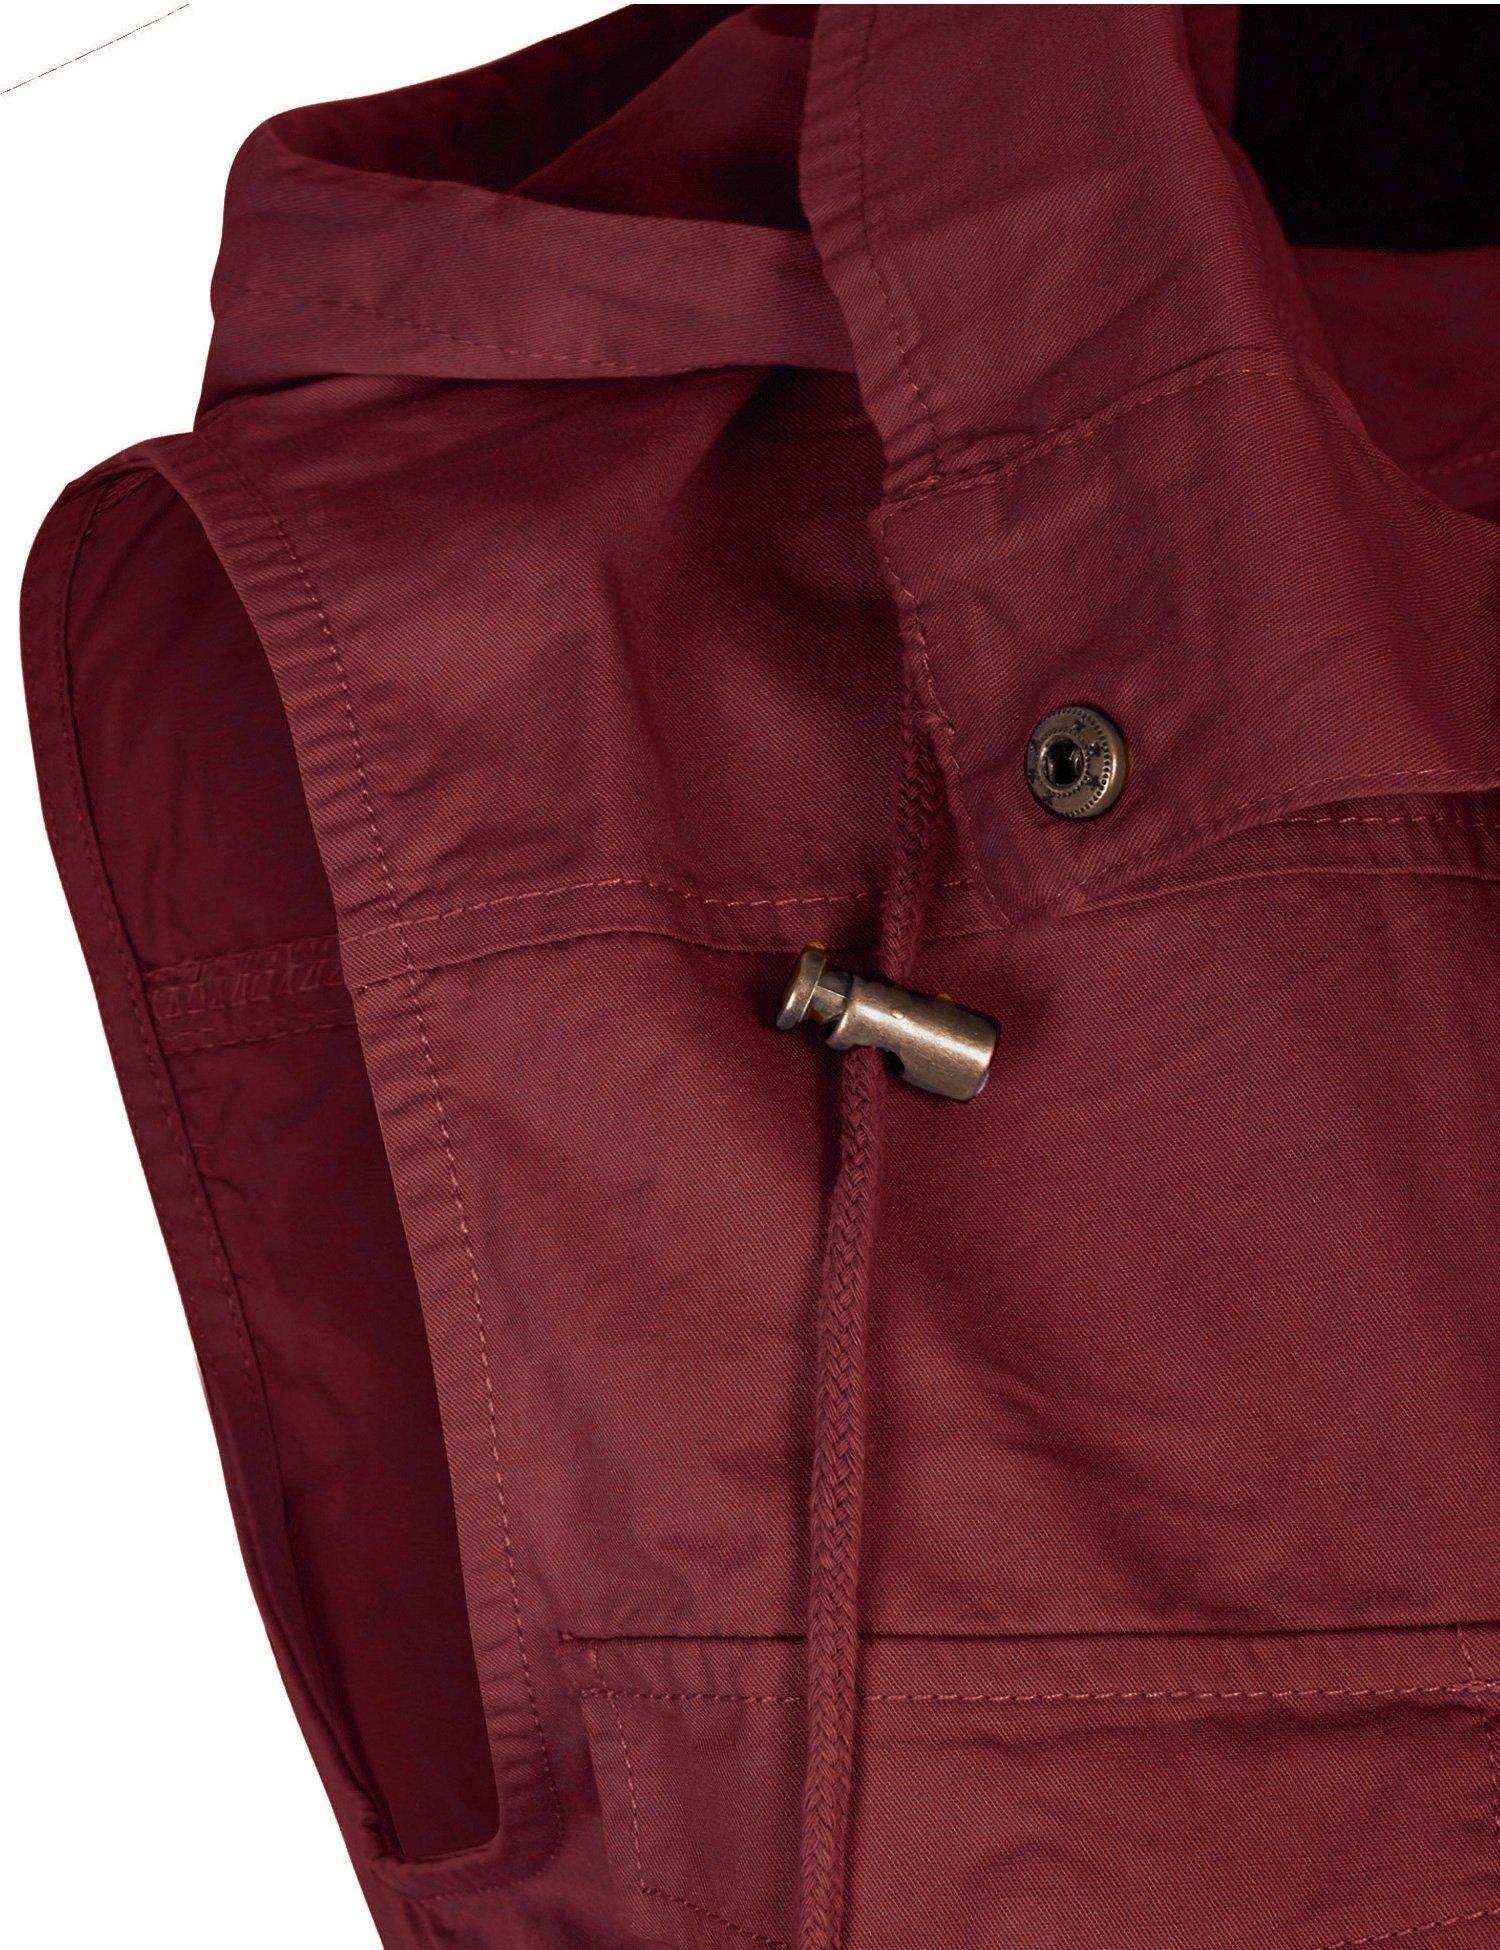 KOGMO Womens Military Anorak Safari Utility Vest with Hood-3X-WINE by KOGMO (Image #5)